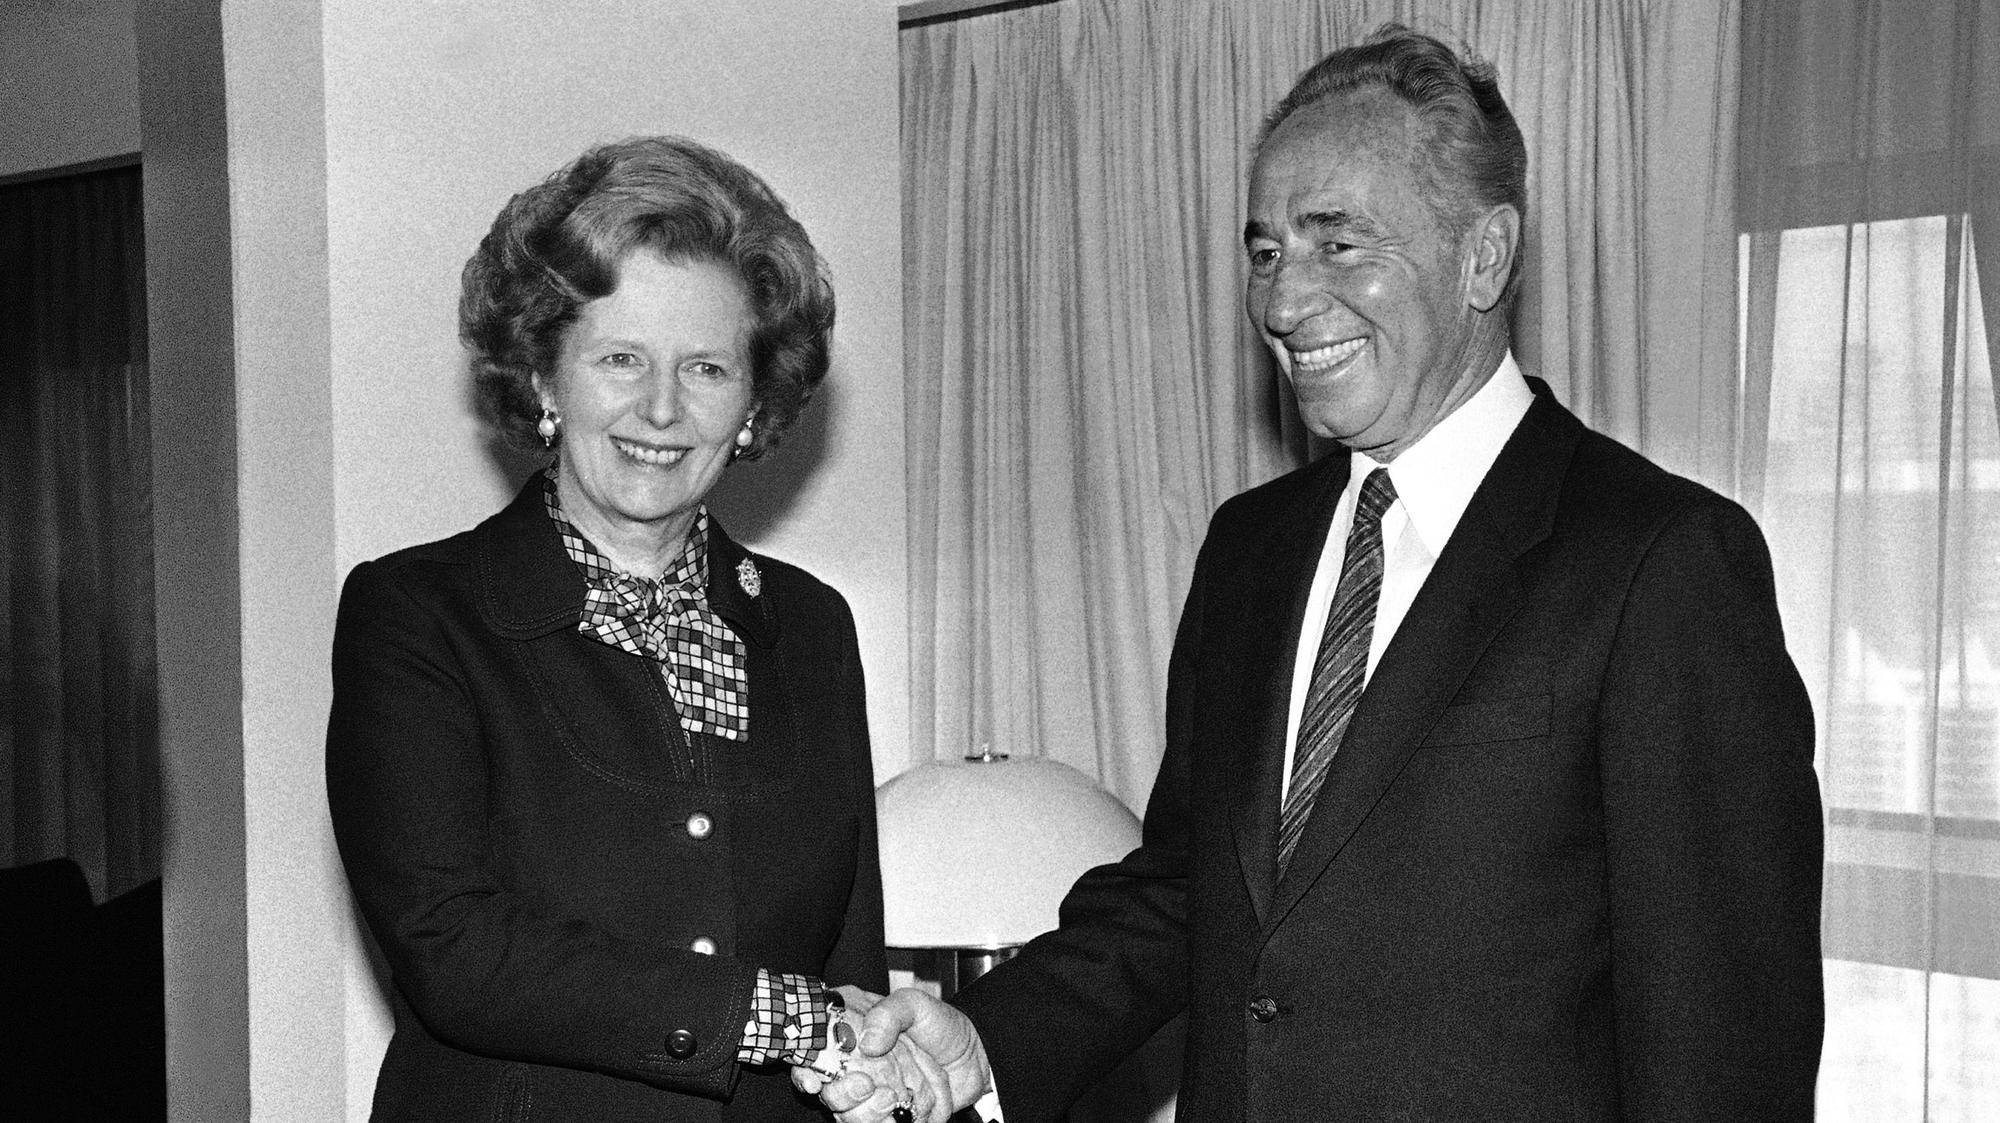 שמעון פרס ומרגרט תאצ'ר, ניו יורק אוקטובר 1985. AP